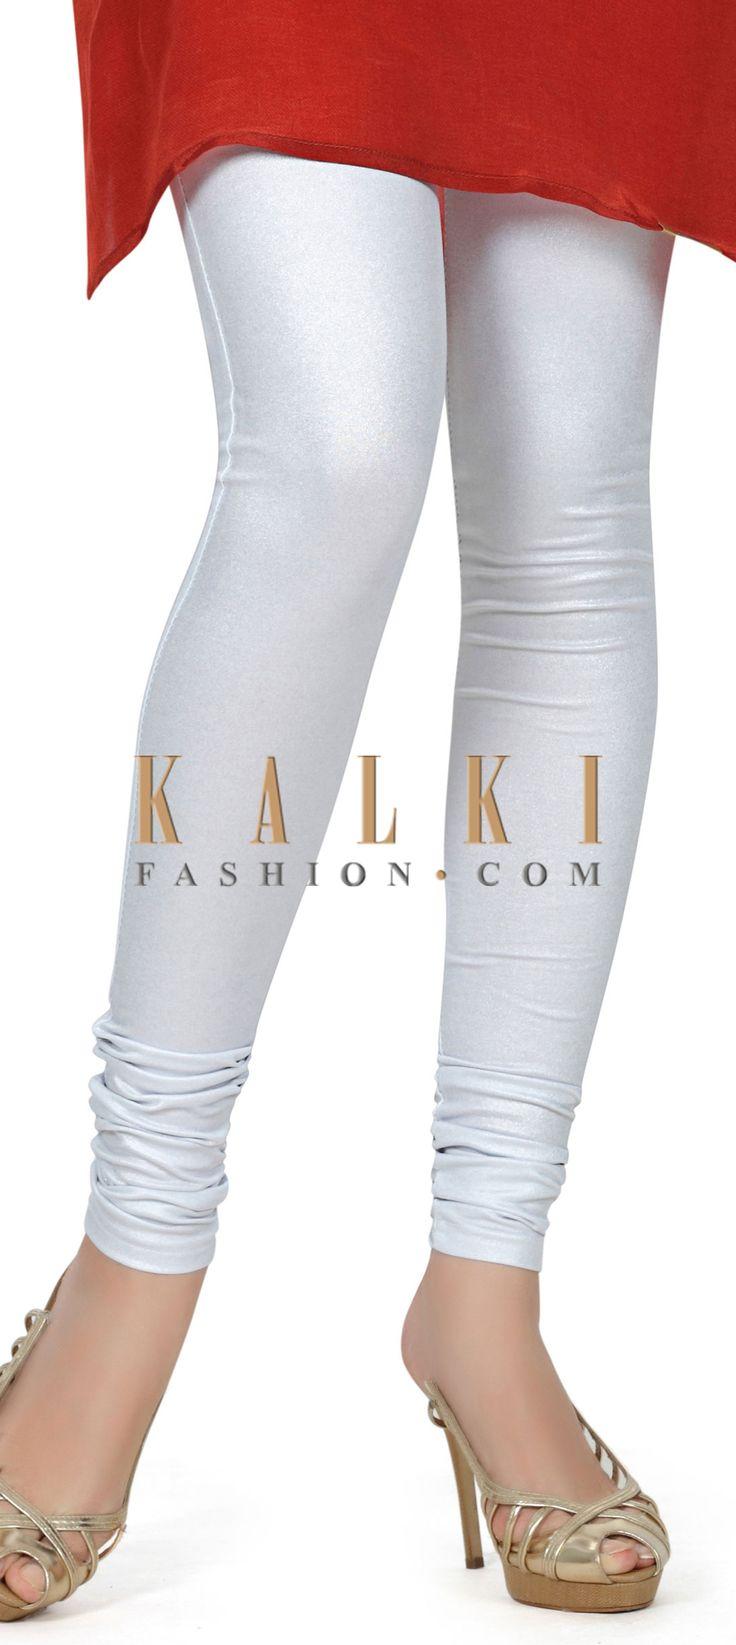 Buy this Featuring shimmer white legging only on Kalki